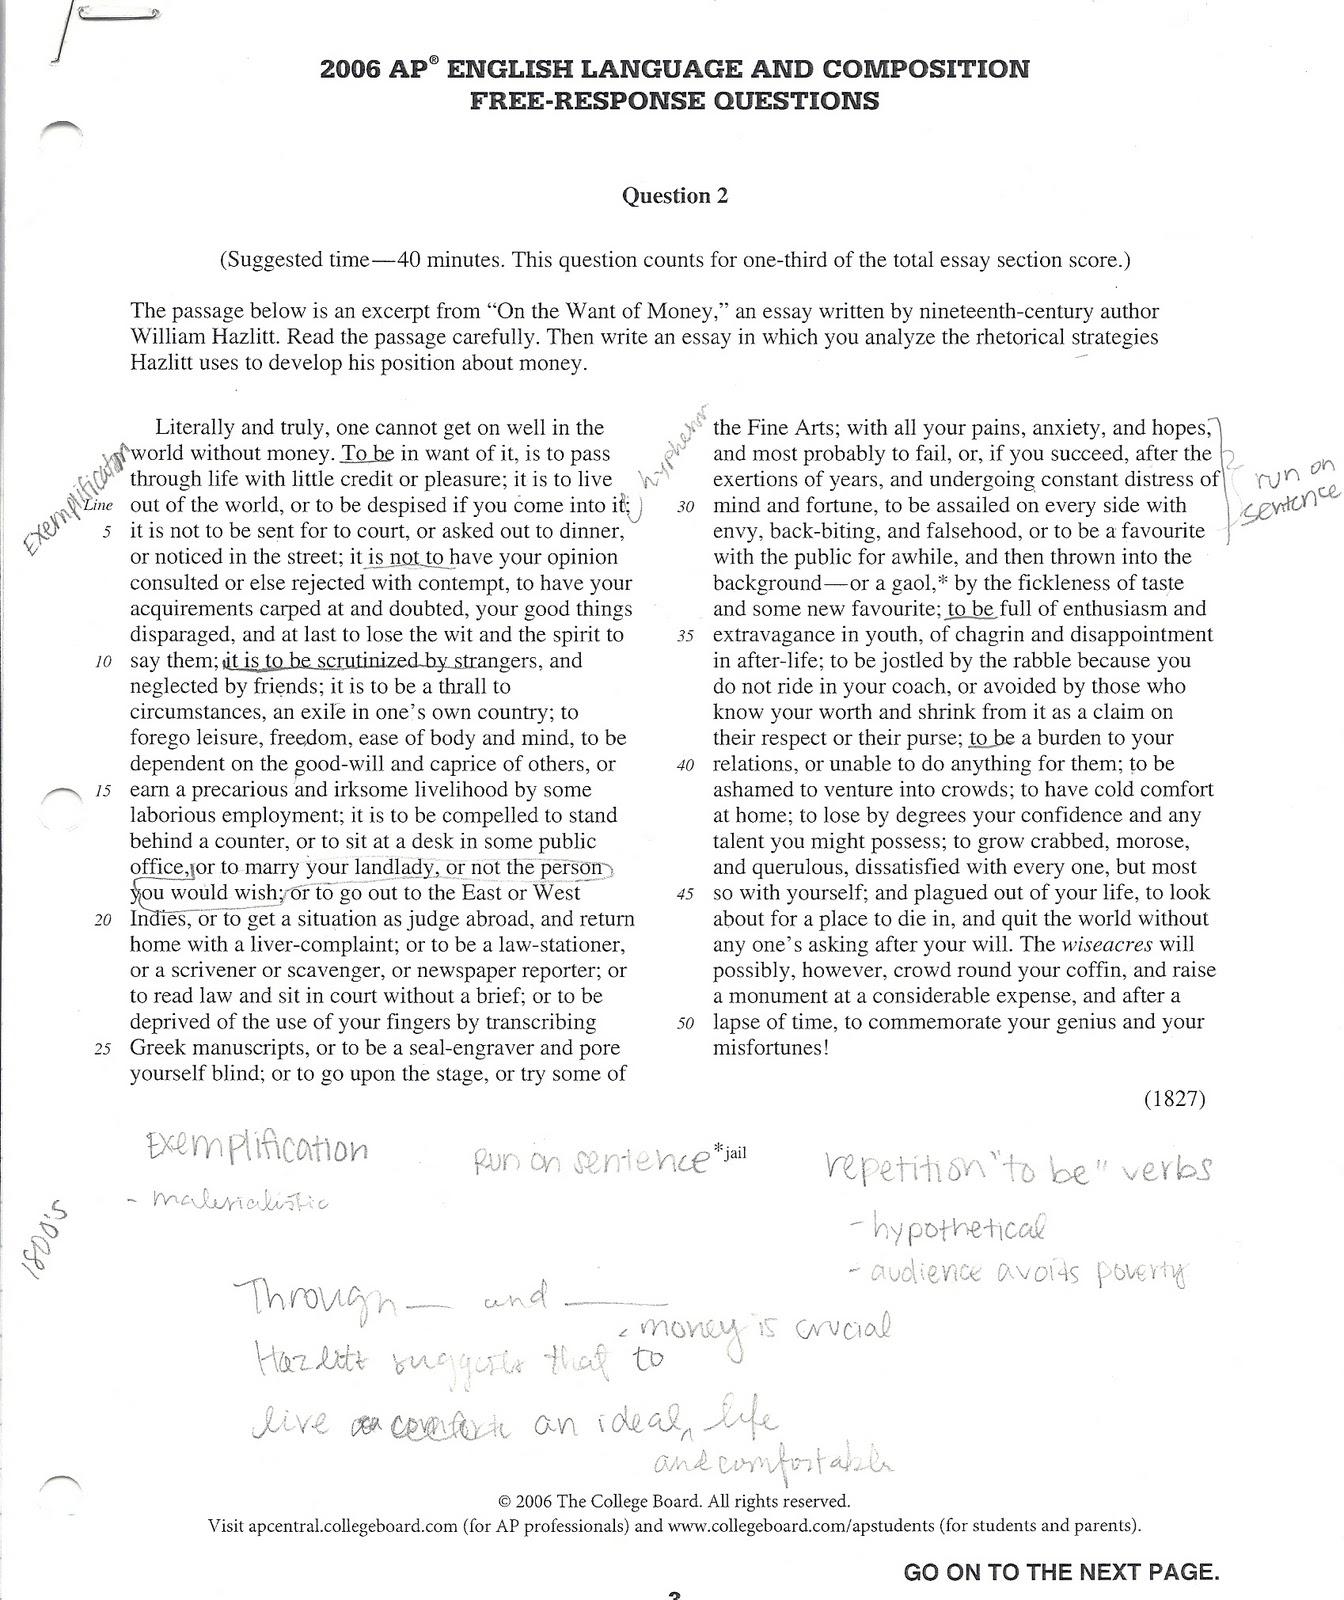 006 Essay Example Ap Prompts